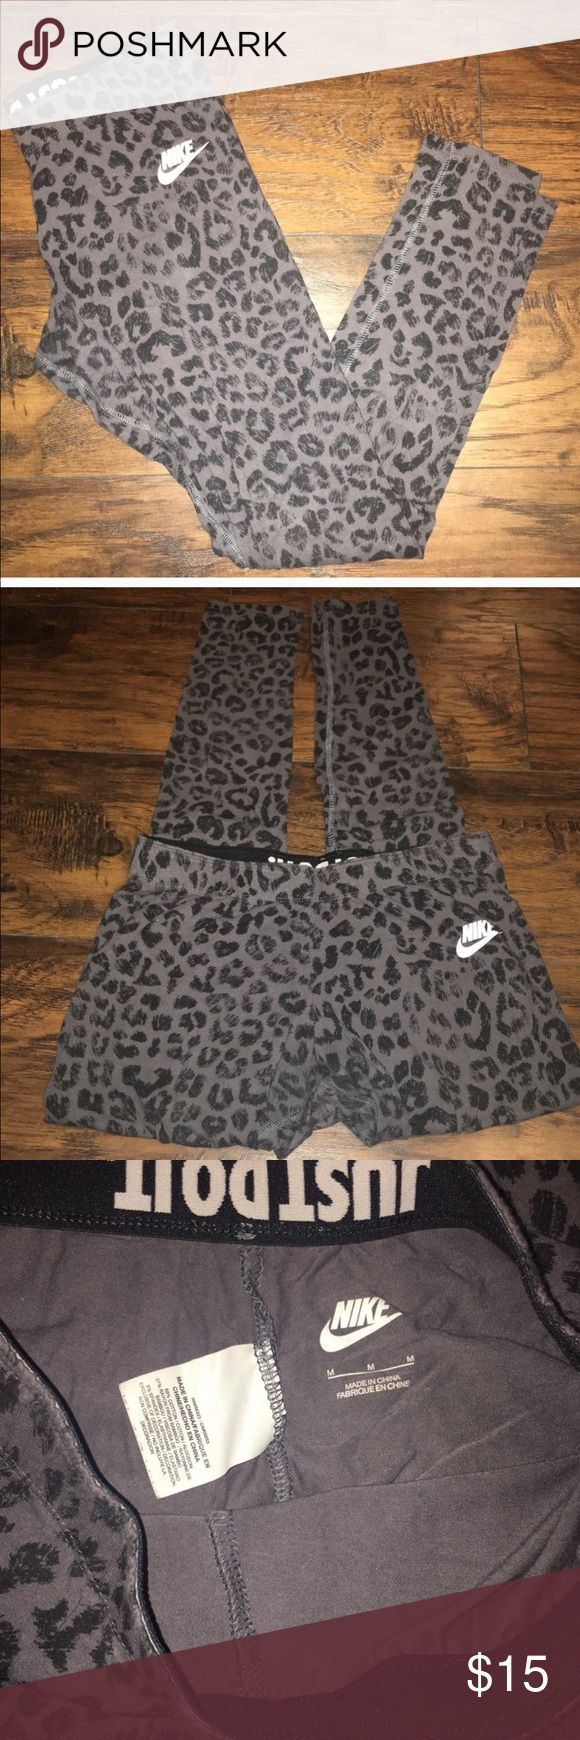 Nike leopard print leggings Nike leopard print leggings. Size medium. Only worn once. Nike Pants Leggings